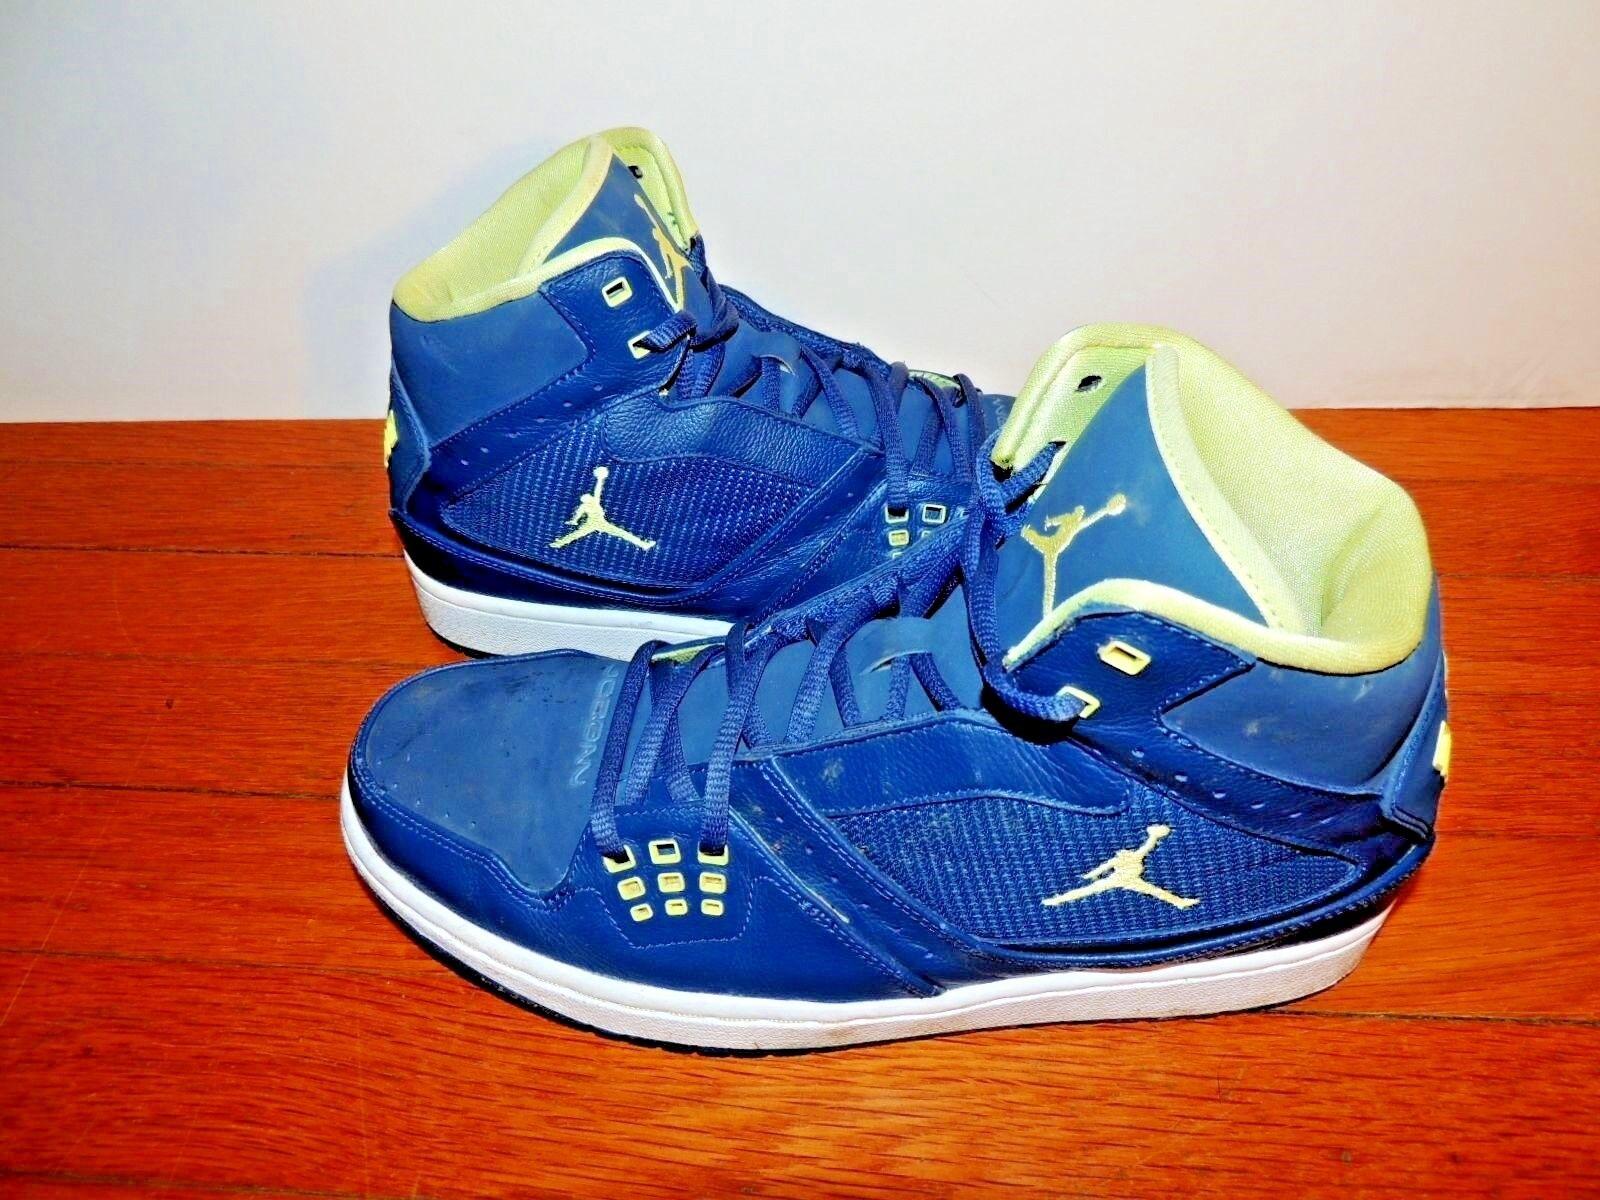 The latest discount shoes for men and women Nike Air Jordan 372704-415 Sneaker Shoe 9 Basketball Retro 1 I Flight Blue OG